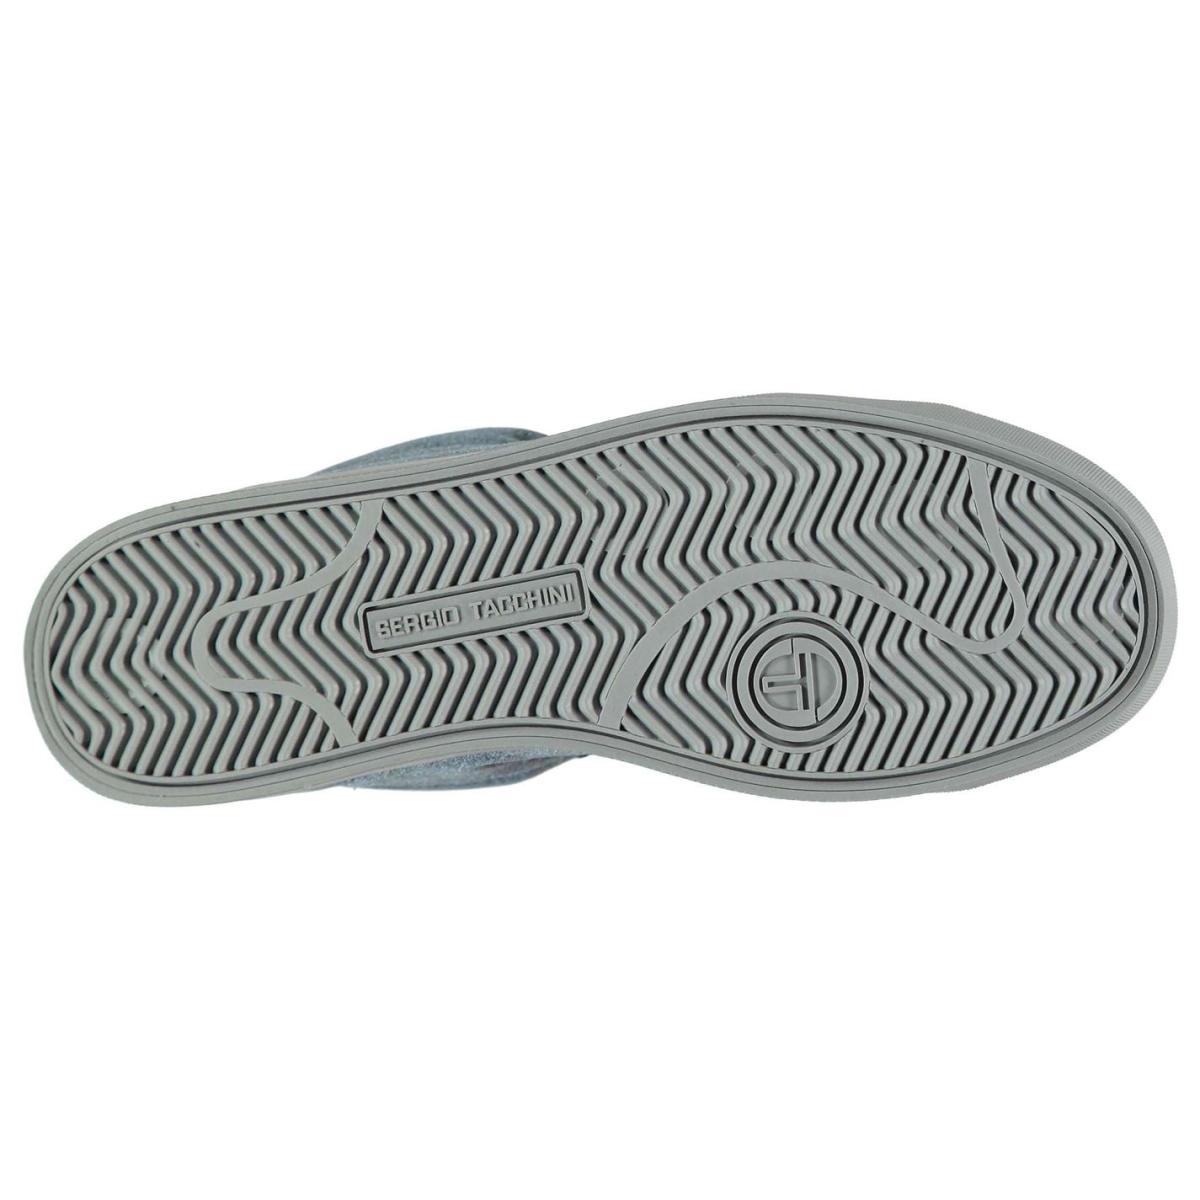 Sergio-Tacchini-Turnschuhe-Laufschuhe-Damen-Sportschuhe-Sneakers-Velvet-High-502 Indexbild 5